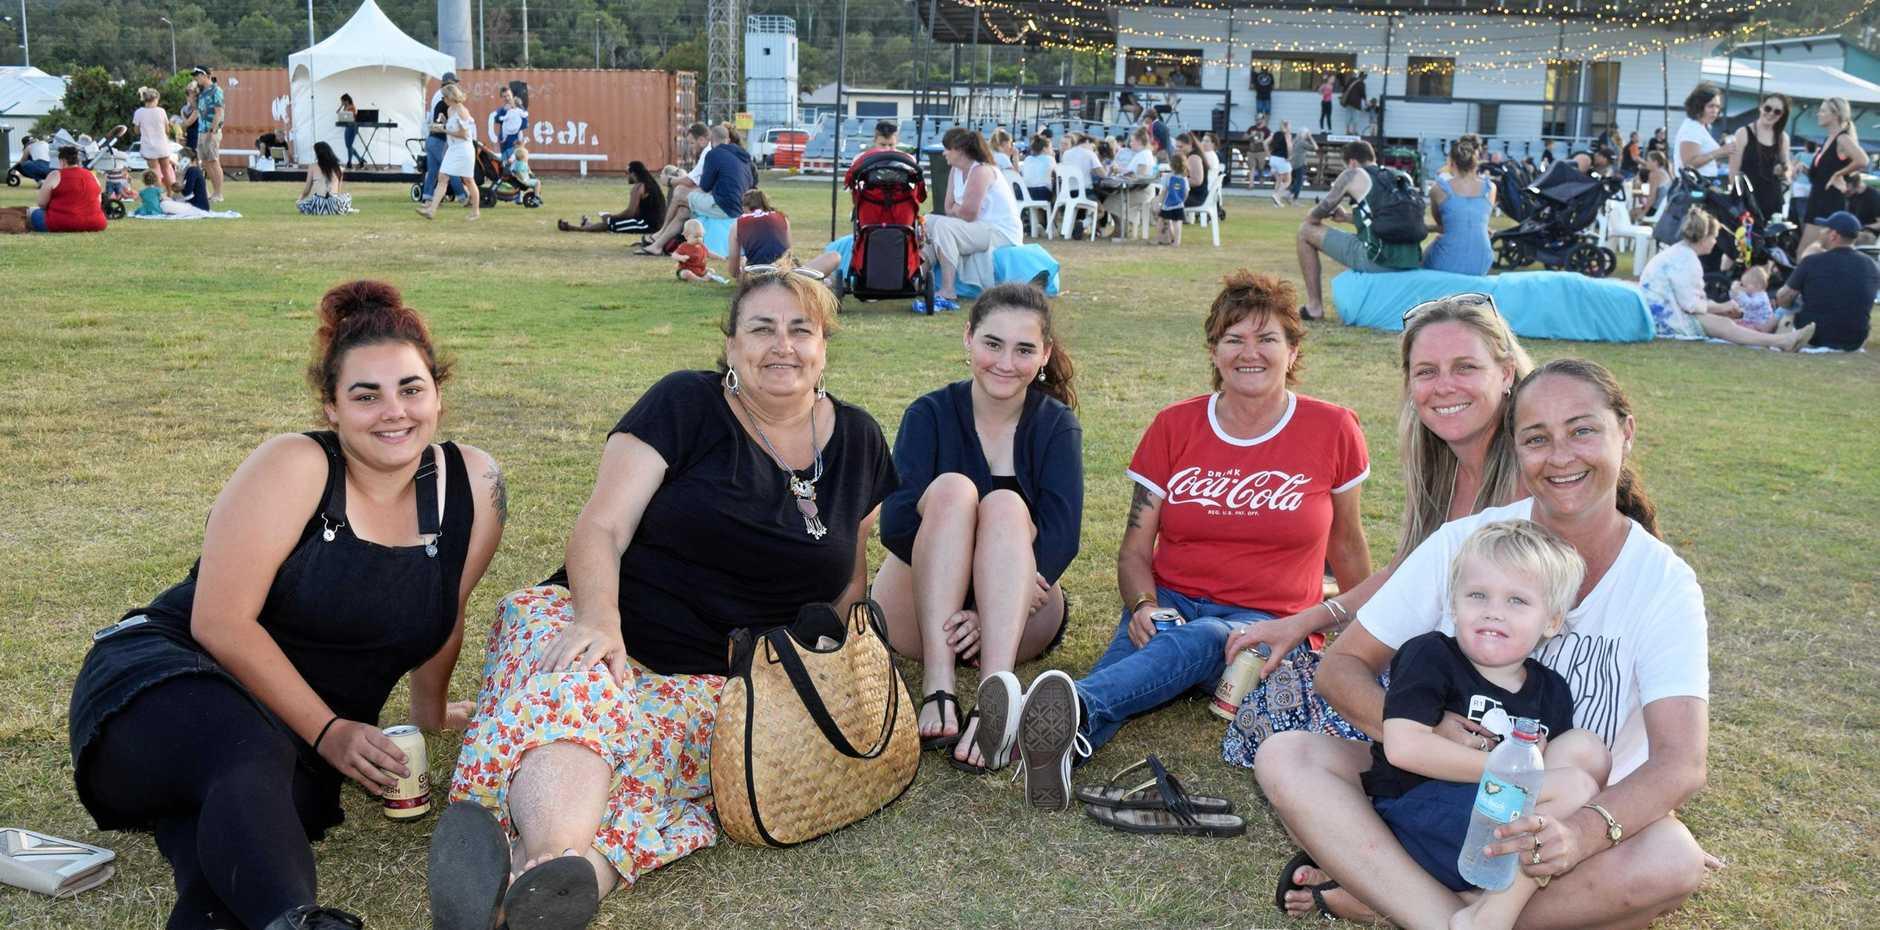 Tahlia Neil, Jules Young, Daisy Neil, Alana Fors, Tara Lucas, Kelly Curra and Jett Curra, 4, at Whitsunday Eats n Treats on Saturday.